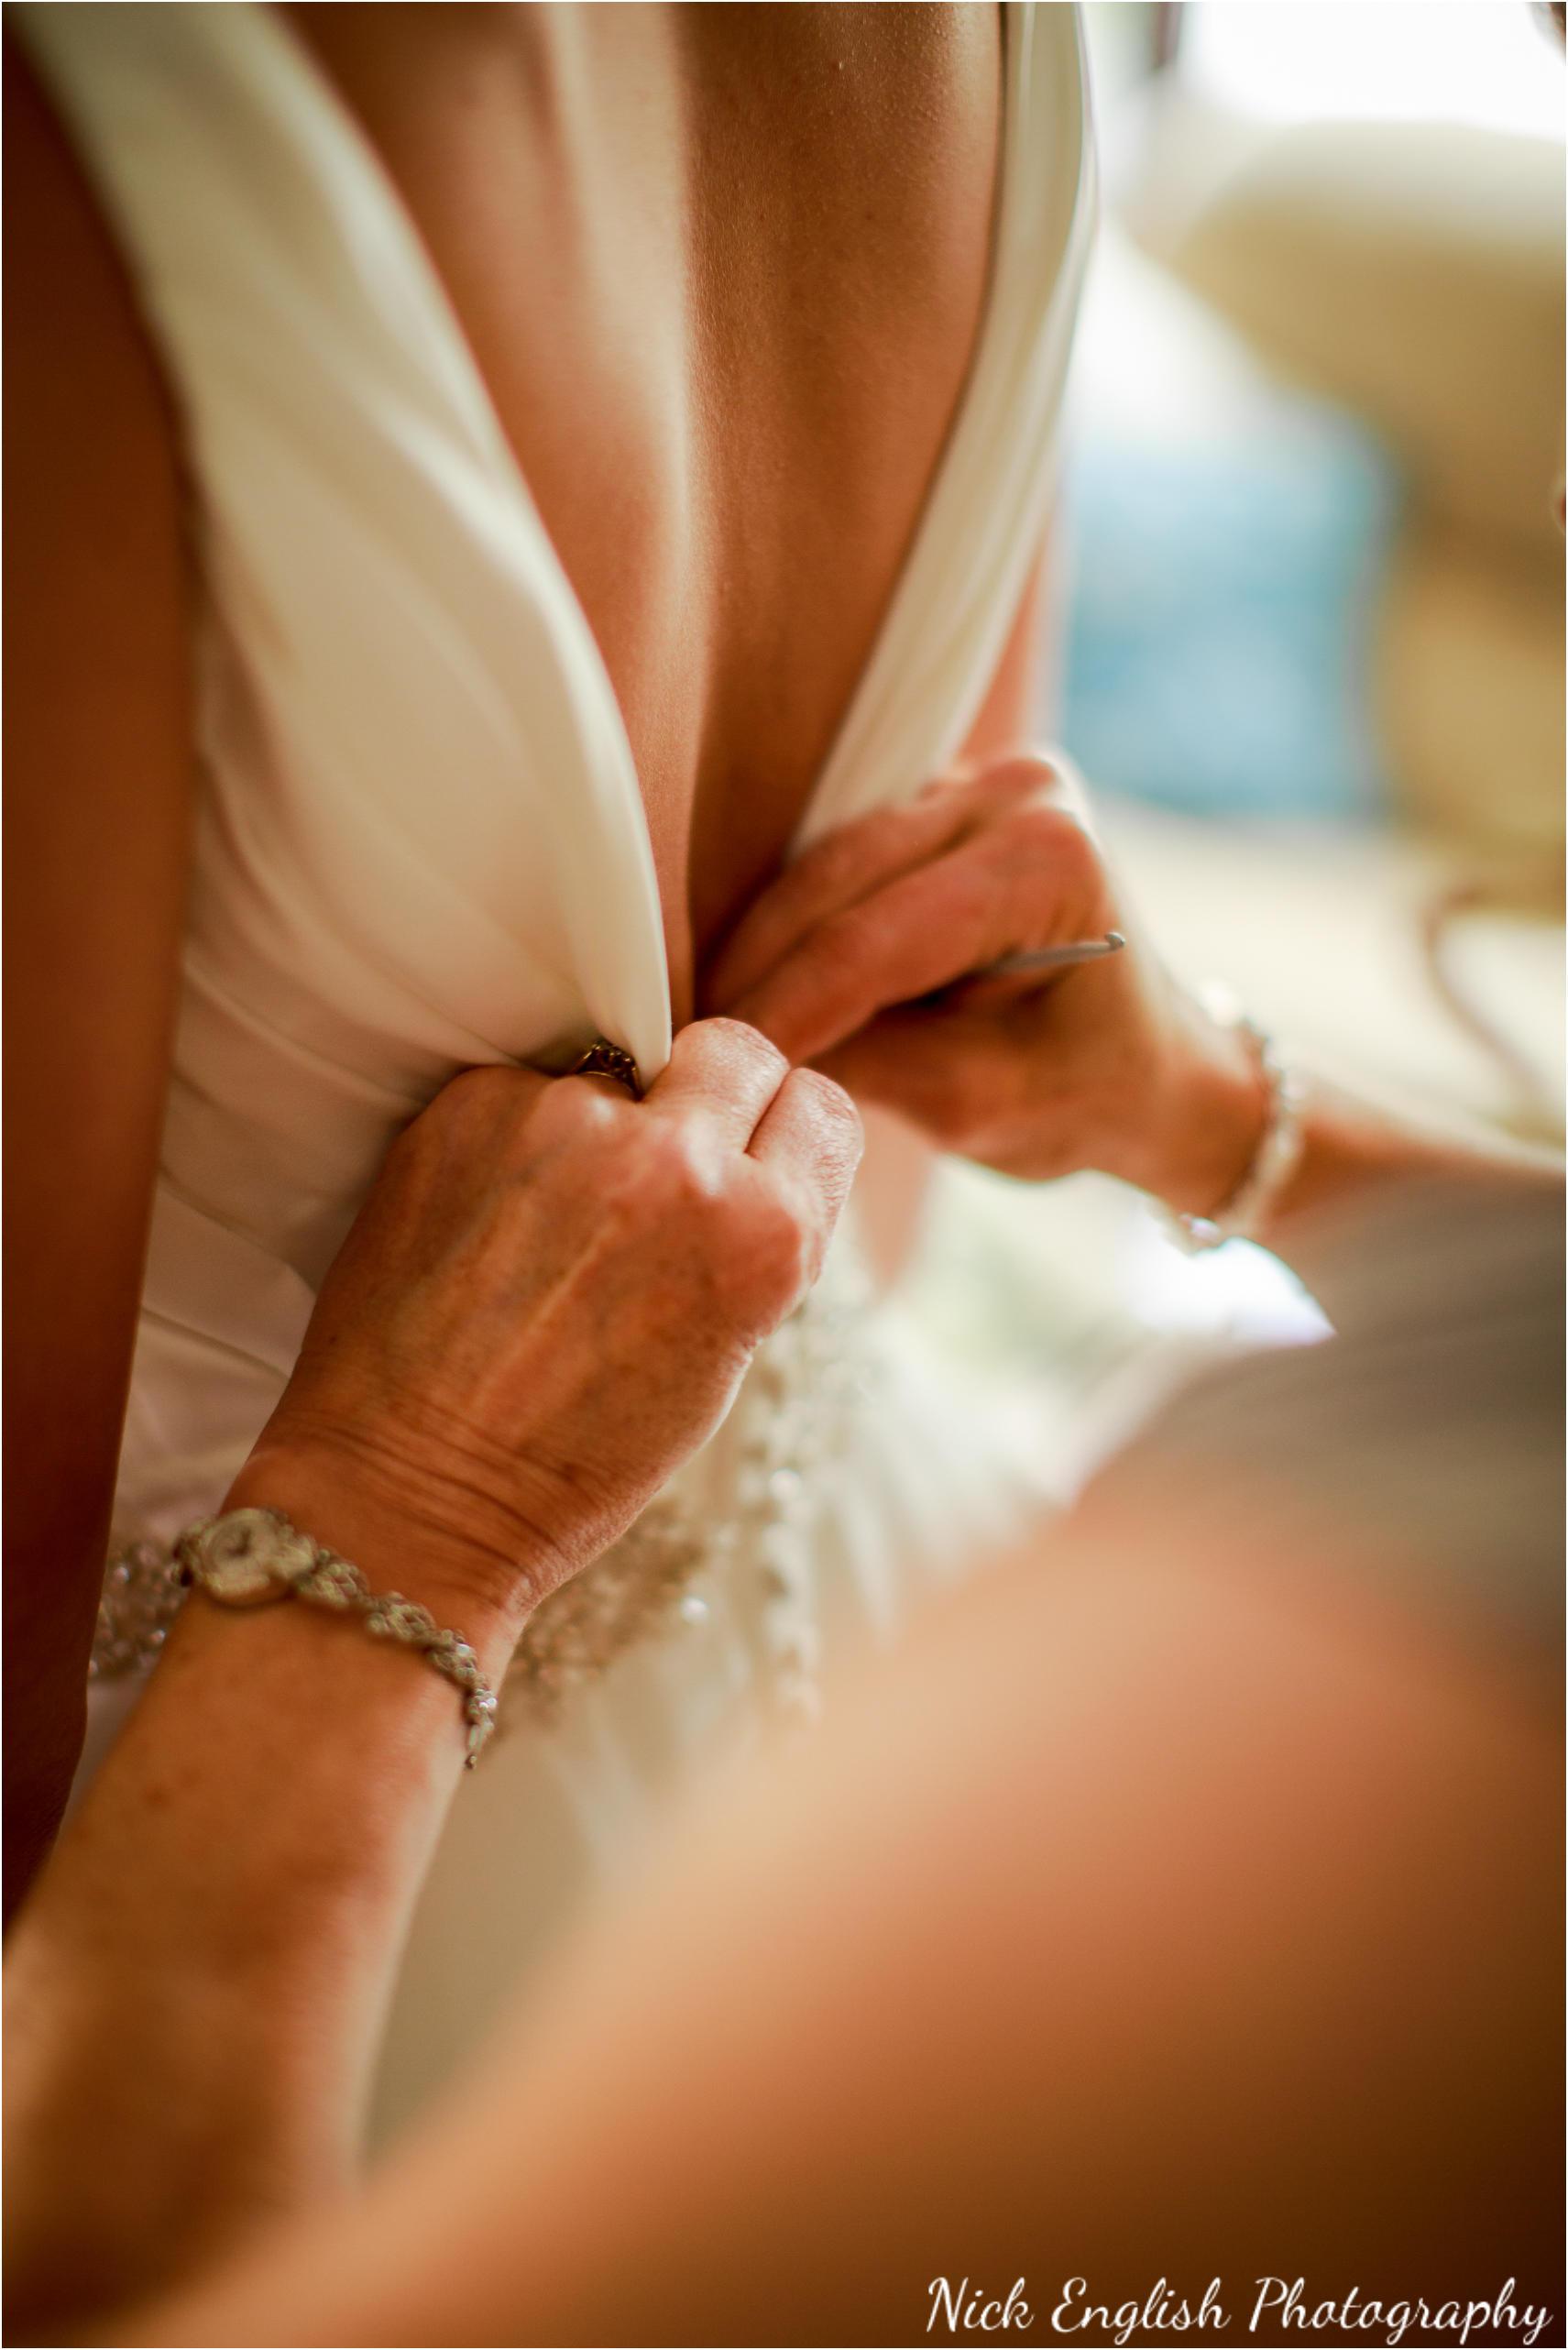 Emily David Wedding Photographs at Barton Grange Preston by Nick English Photography 30jpg.jpeg